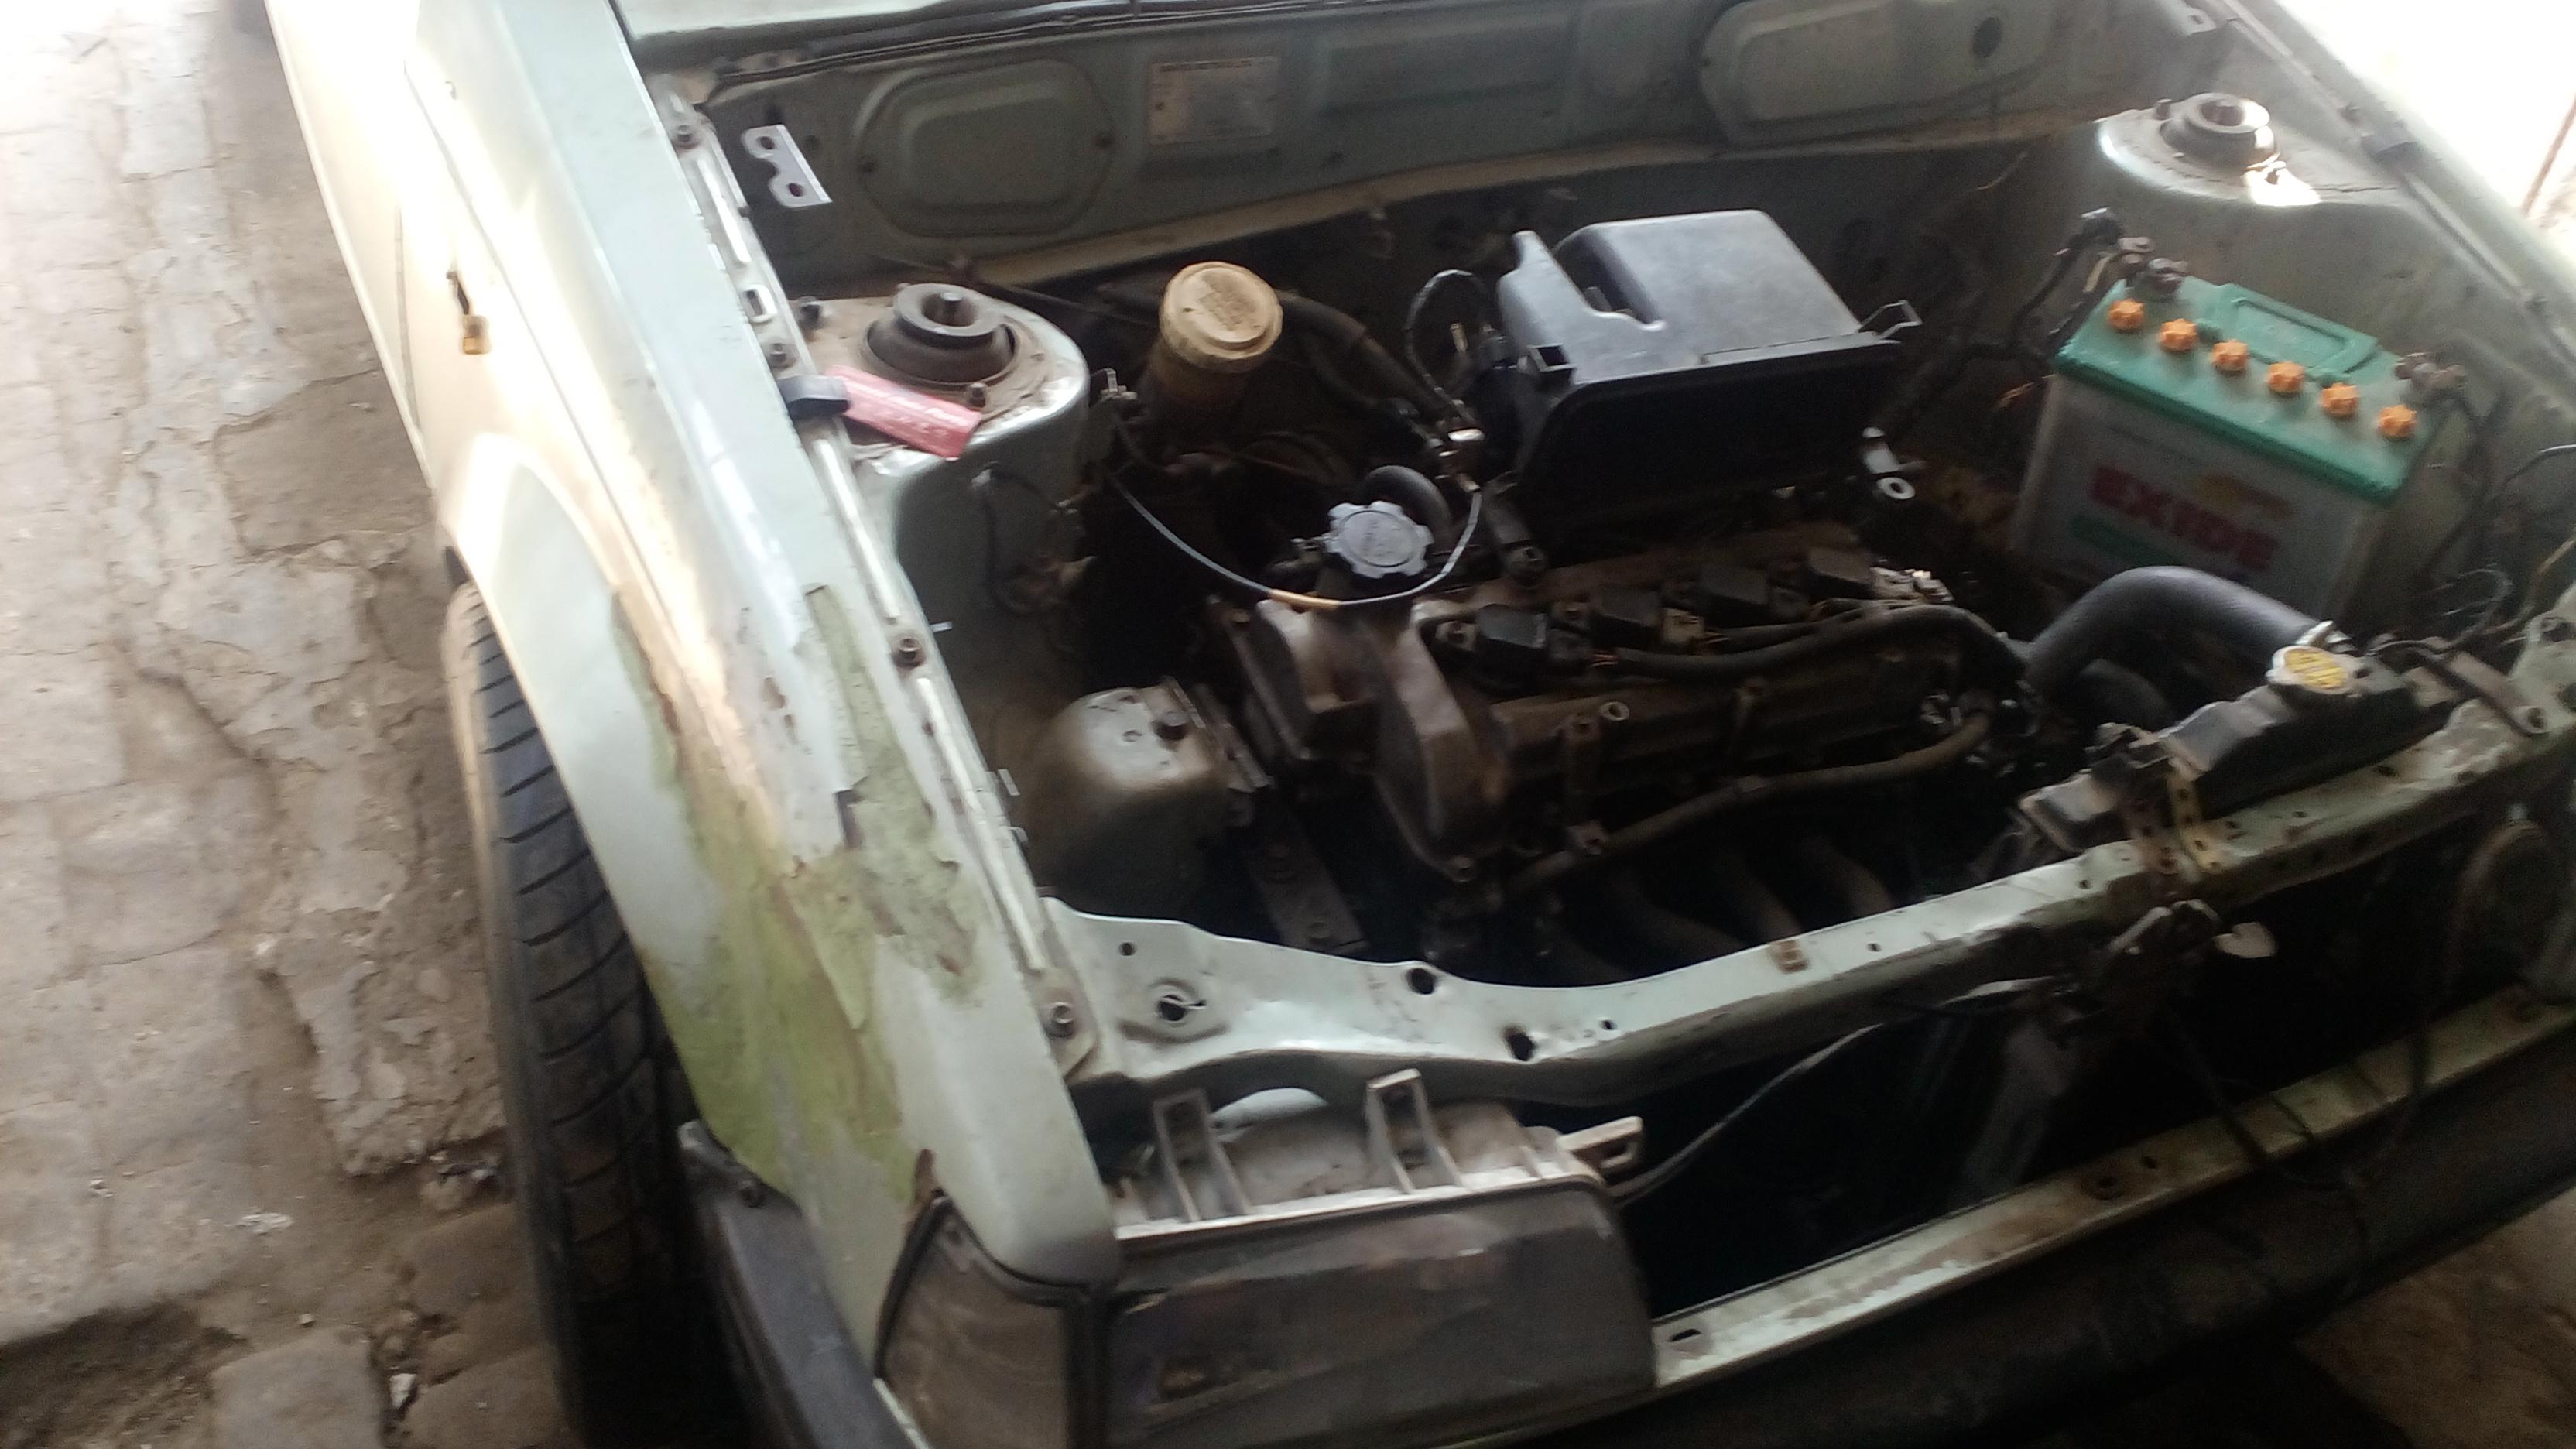 Charade 1985 vitz engine swap modified - Charade - PakWheels Forums